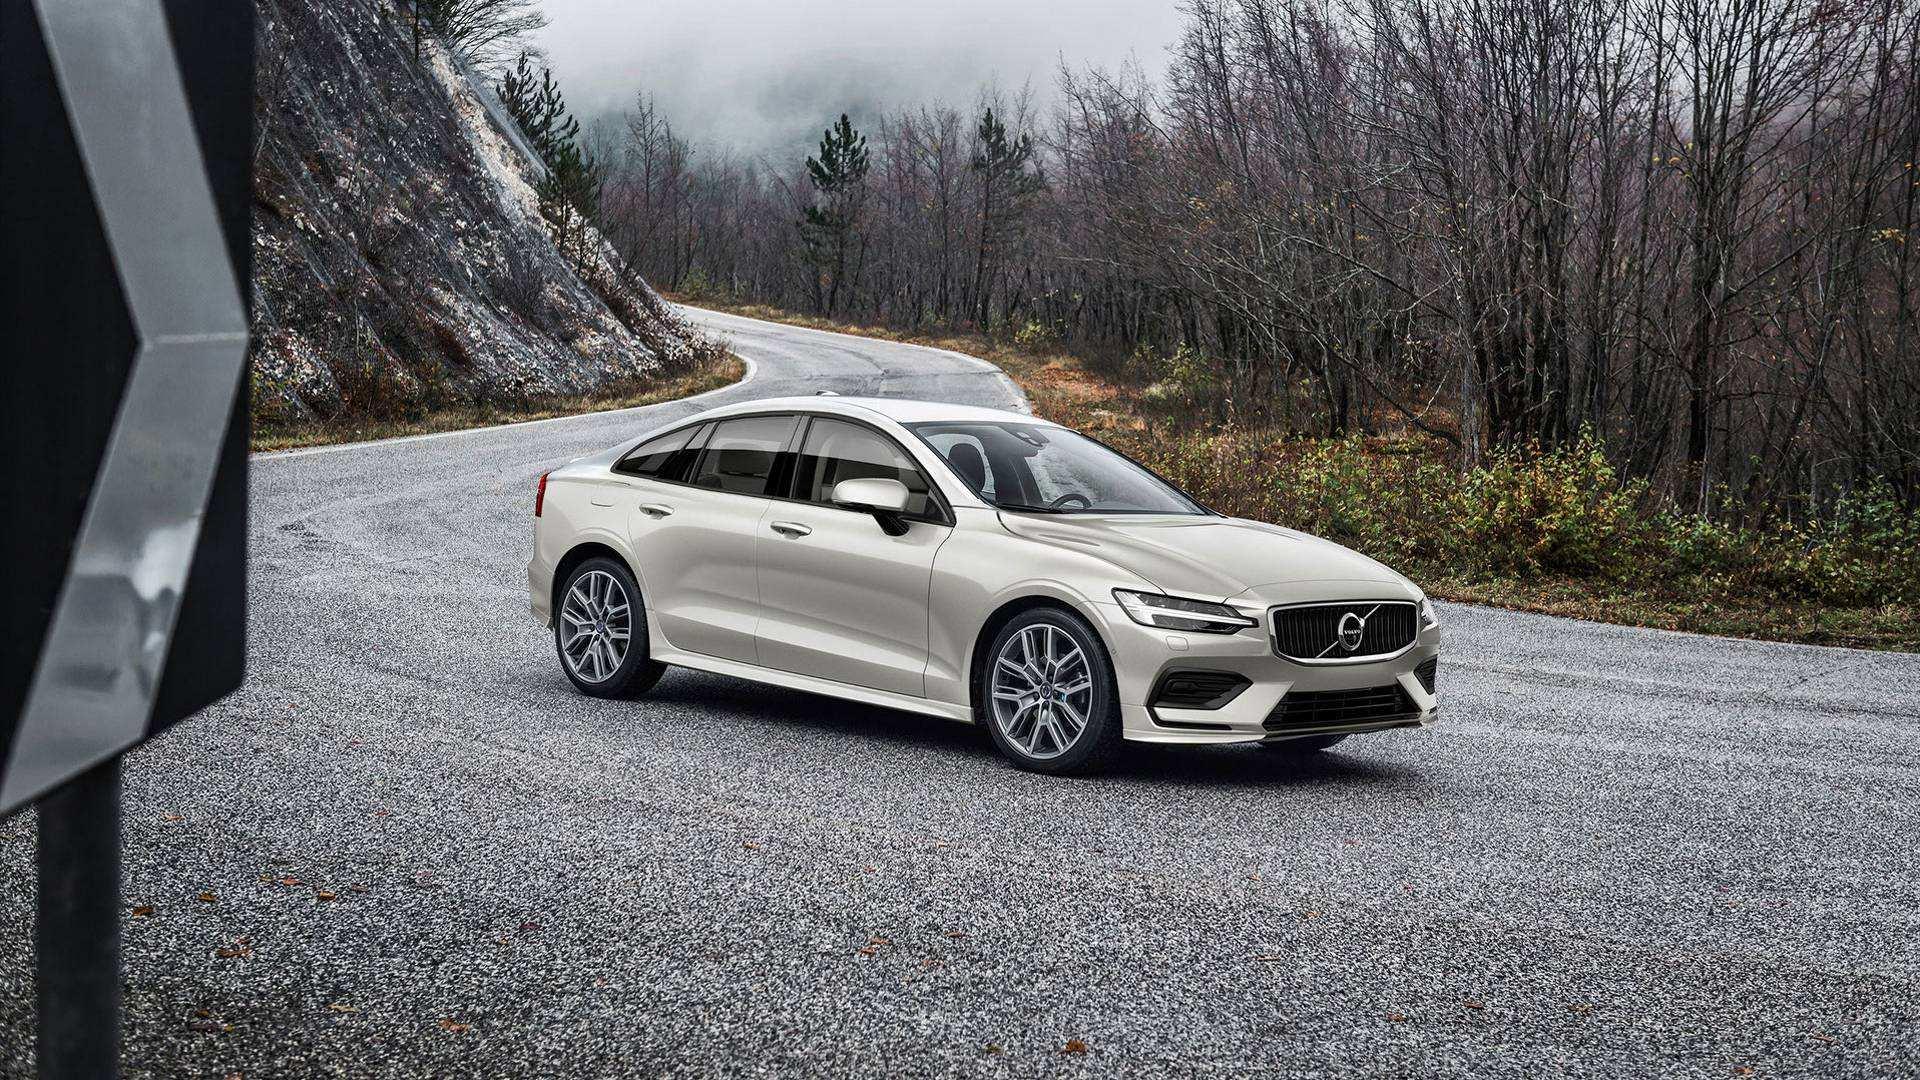 35 Great Volvo Modellar 2019 Rumor Concept by Volvo Modellar 2019 Rumor